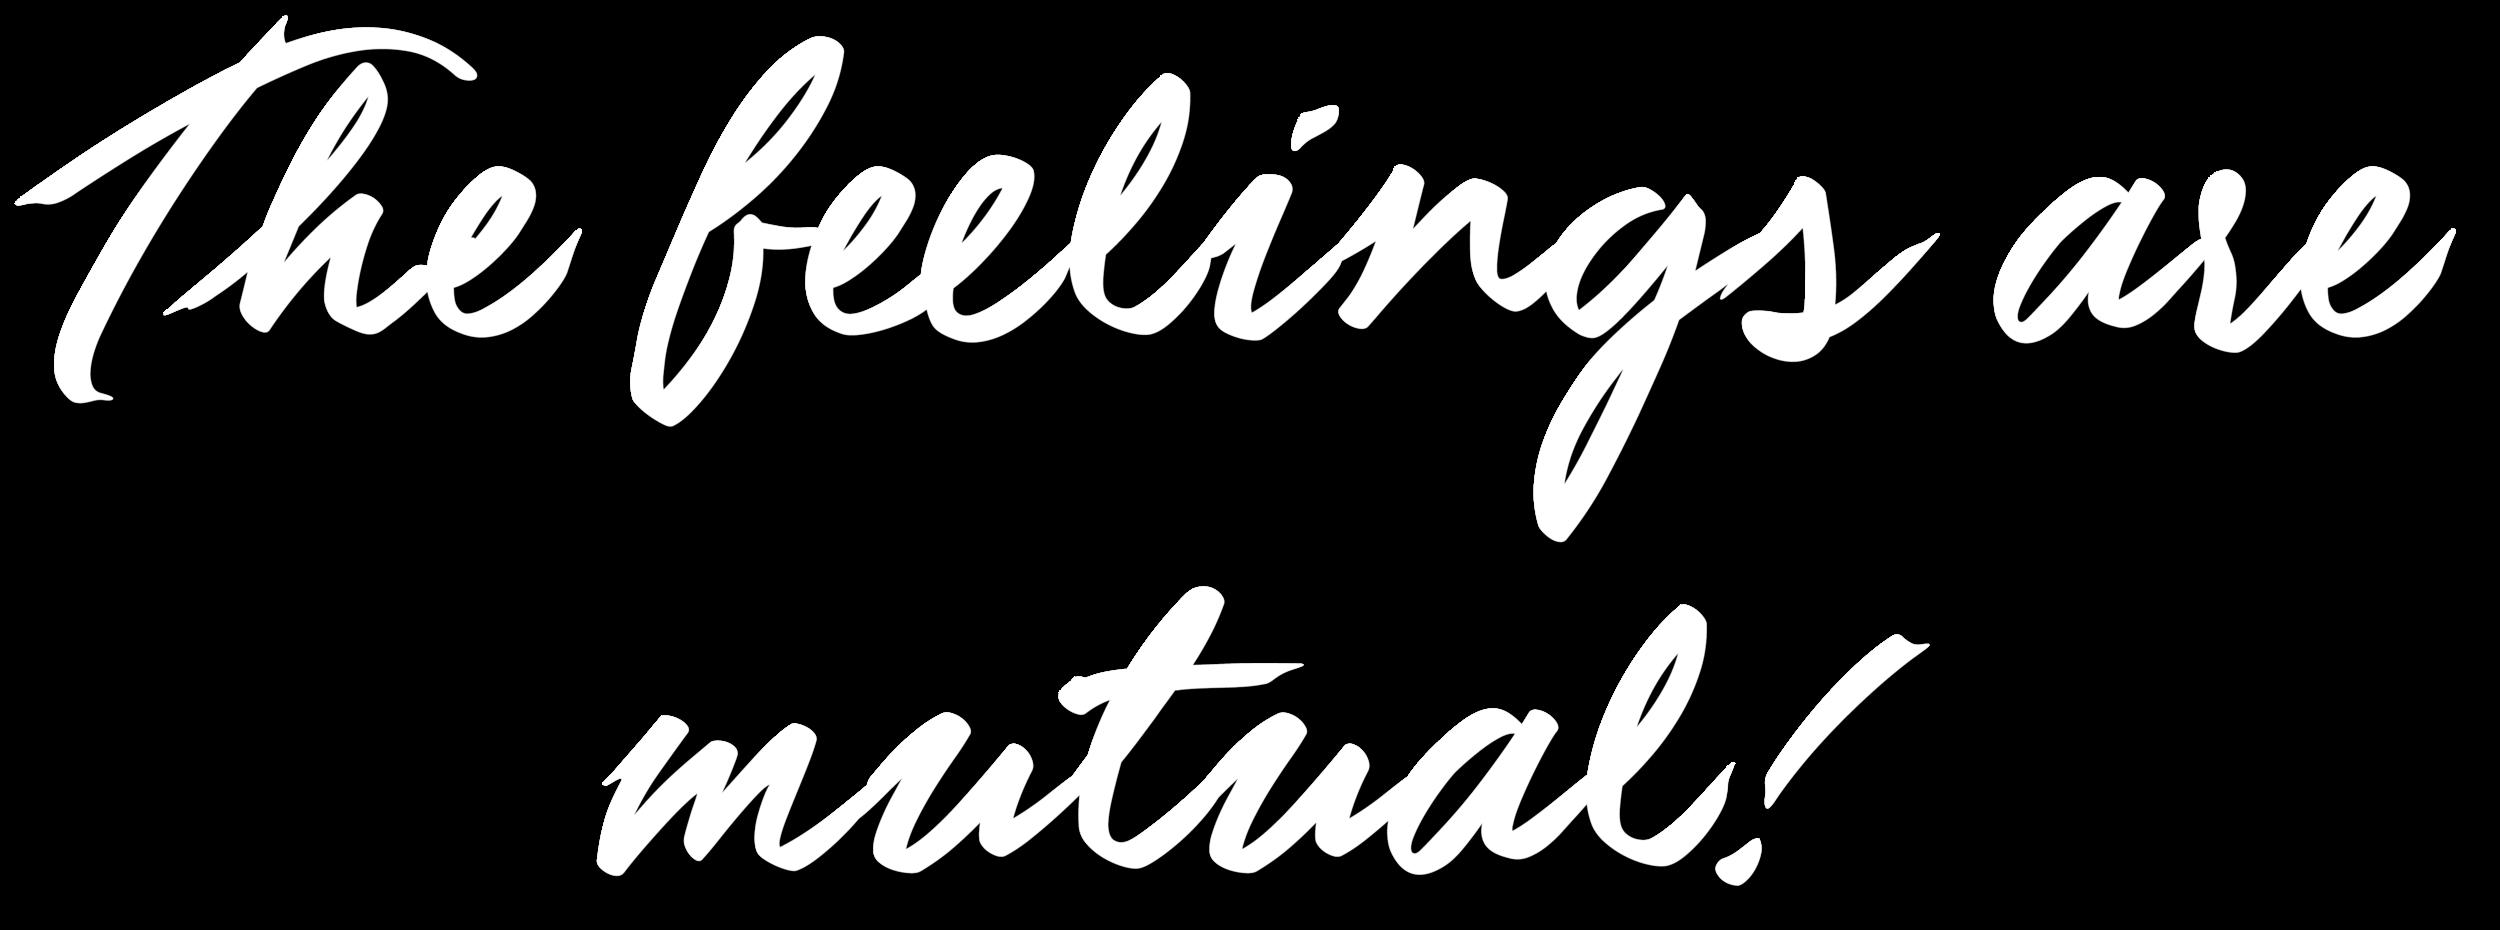 clienttestimonials.png